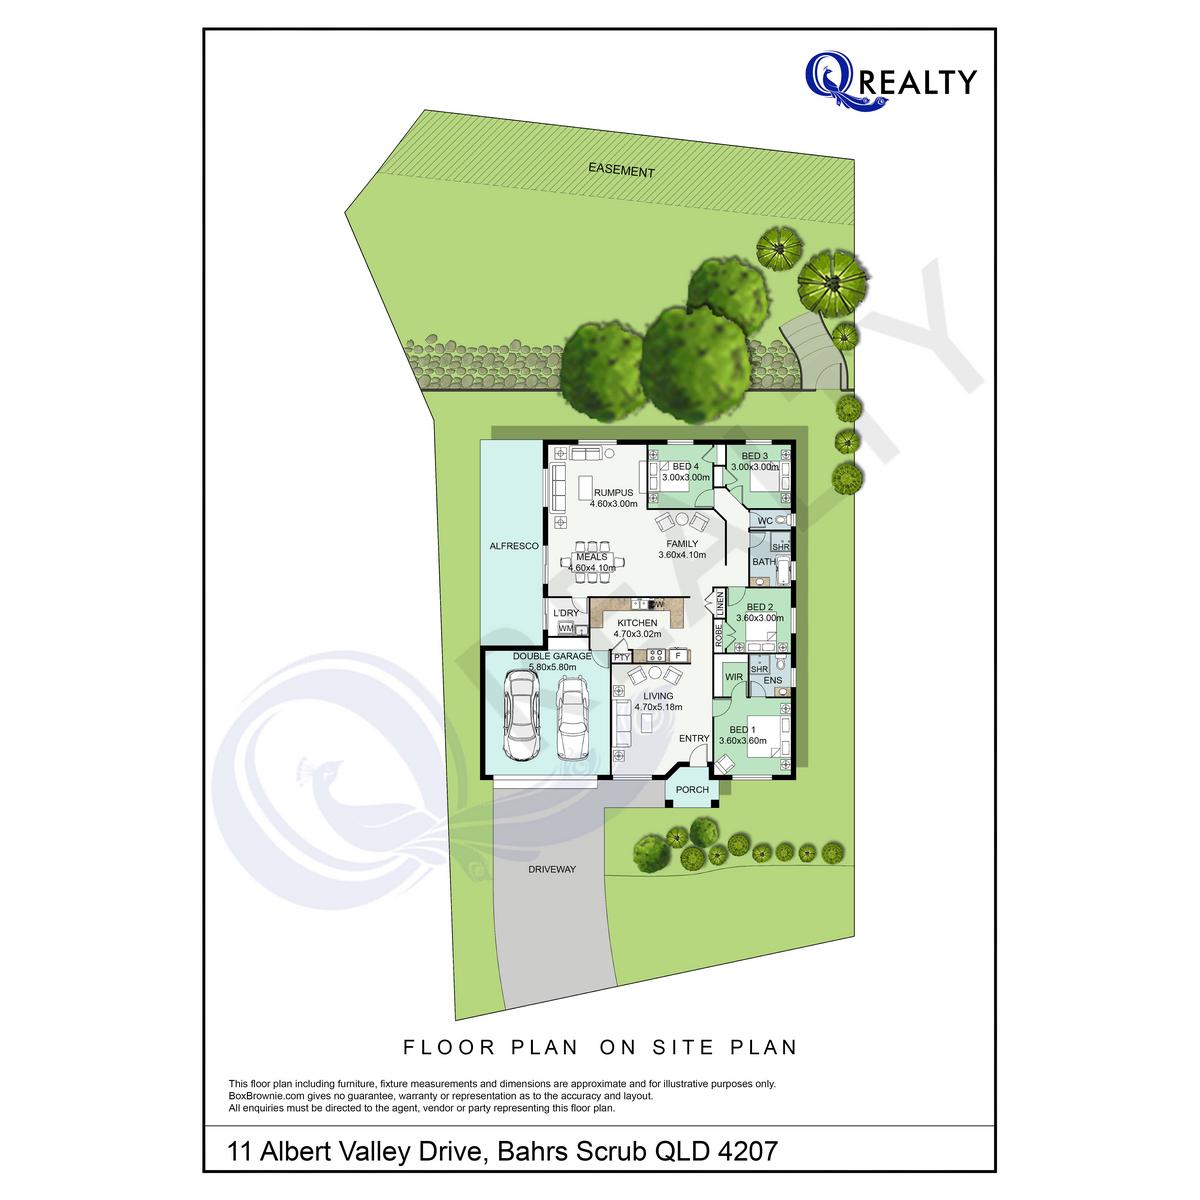 11 Albert Valley Drive, Bahrs Scrub  QLD  4207